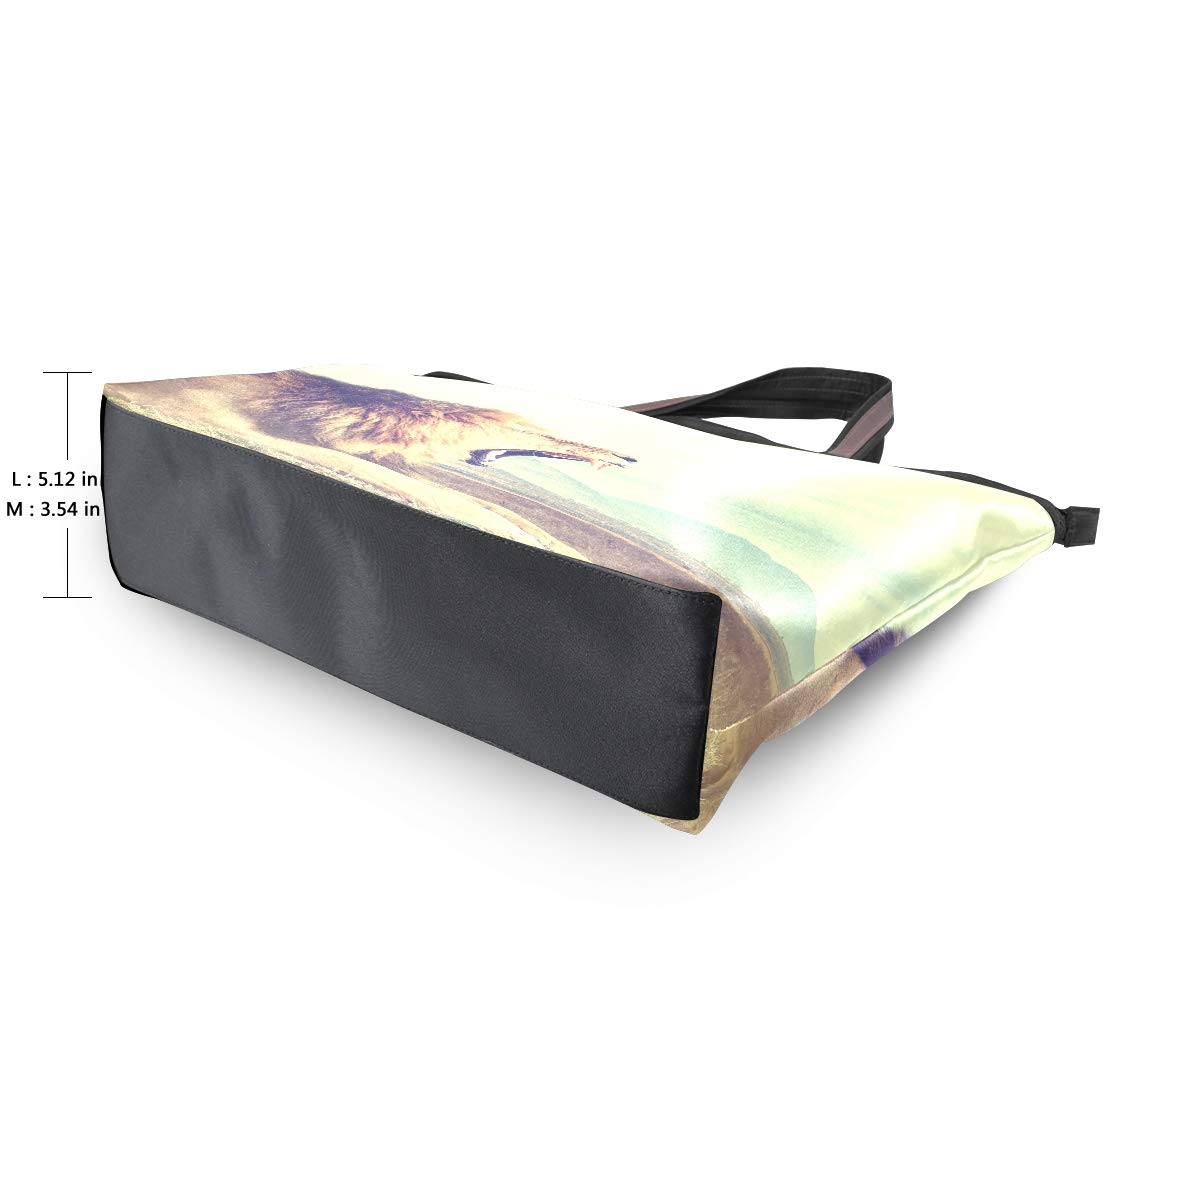 HousingMart Large Women Tote Bag Cool Lion 3D Print Handbags Tote Handle with Zipper Shoulder Bag Grocery Shopping Work Bag